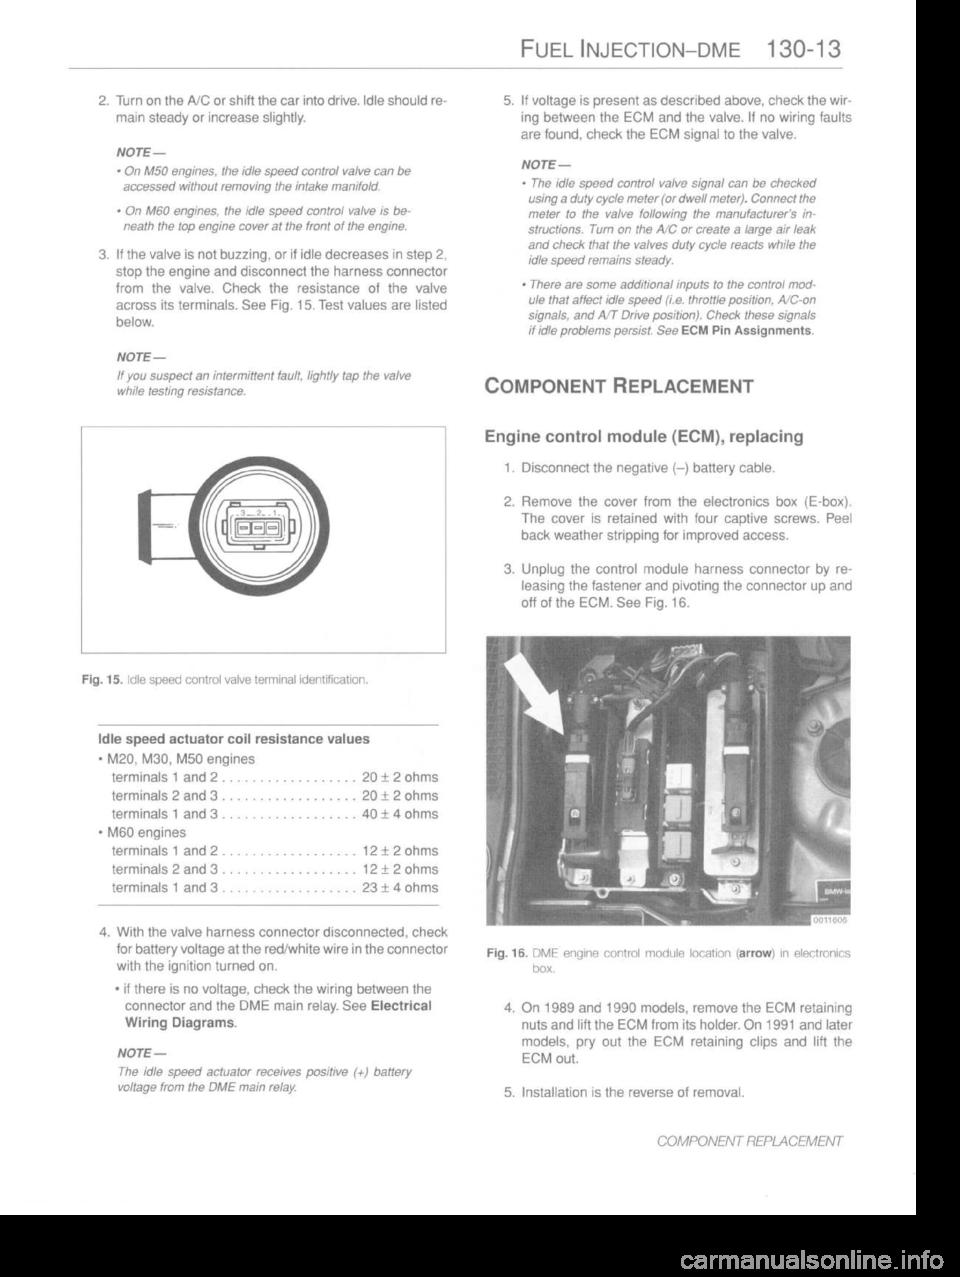 Bmw 530i 1989 E34 Workshop Manual Fuse Box